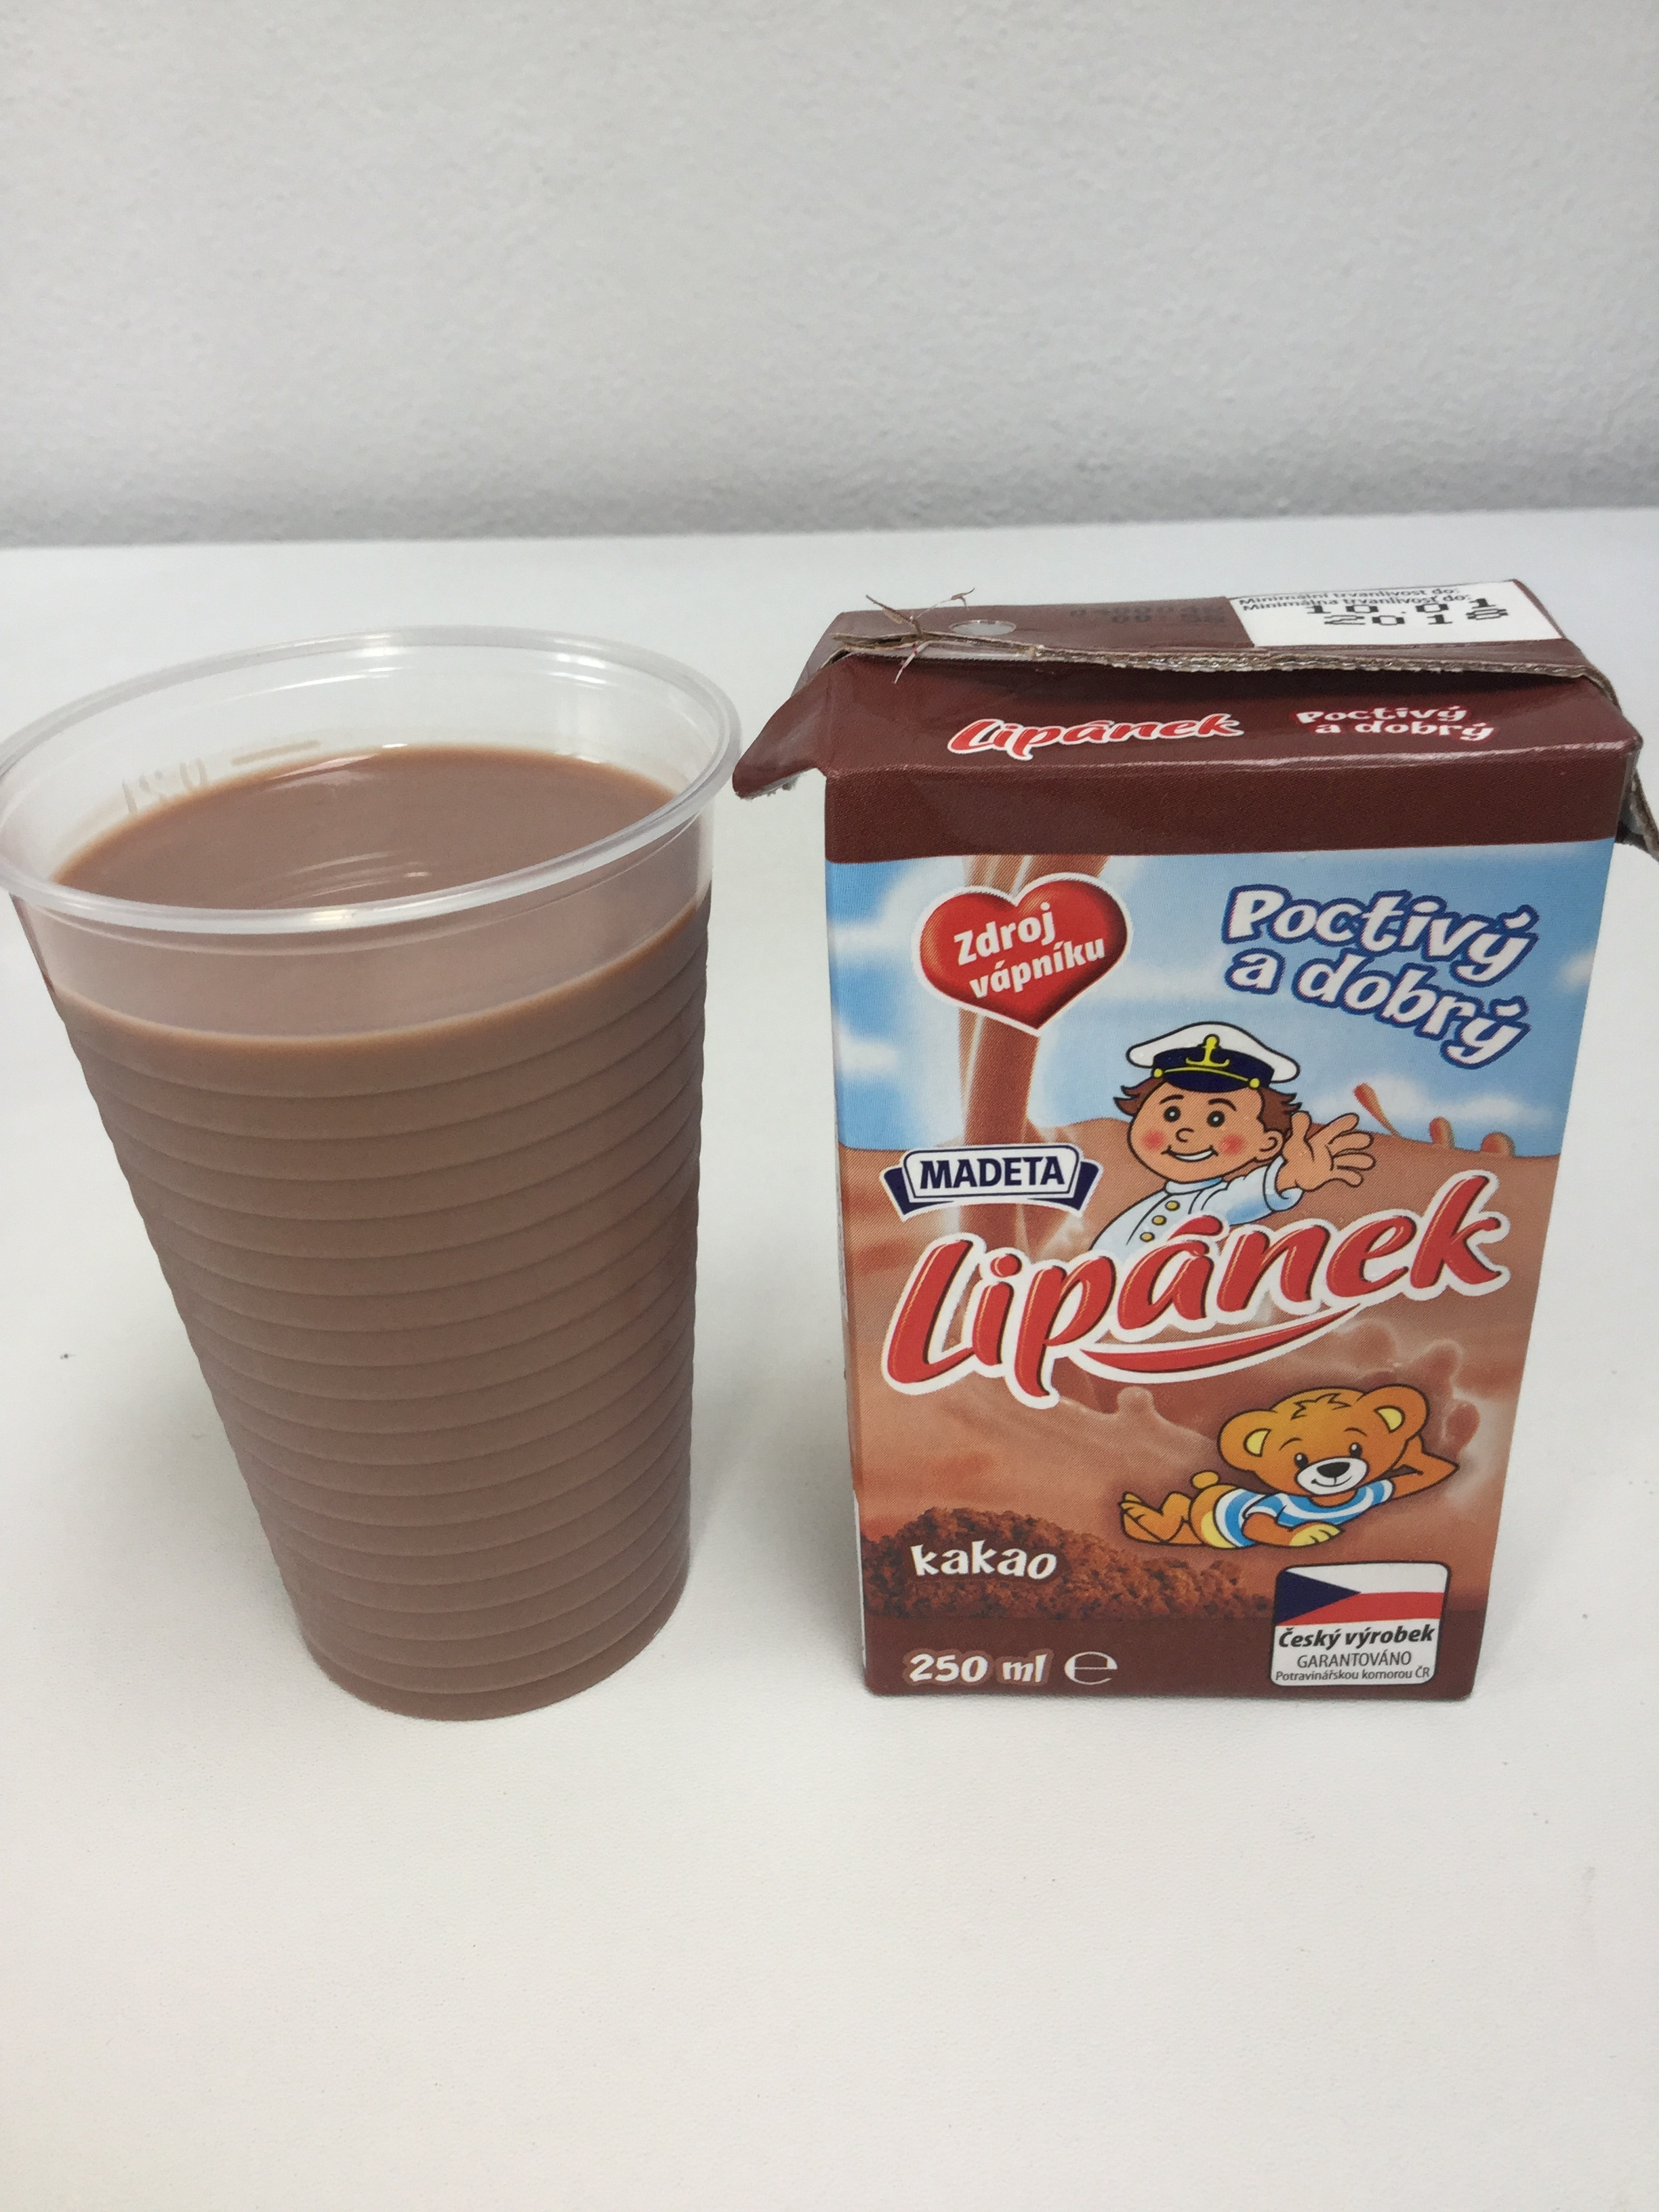 Madeta Lipanek Kakao Cup